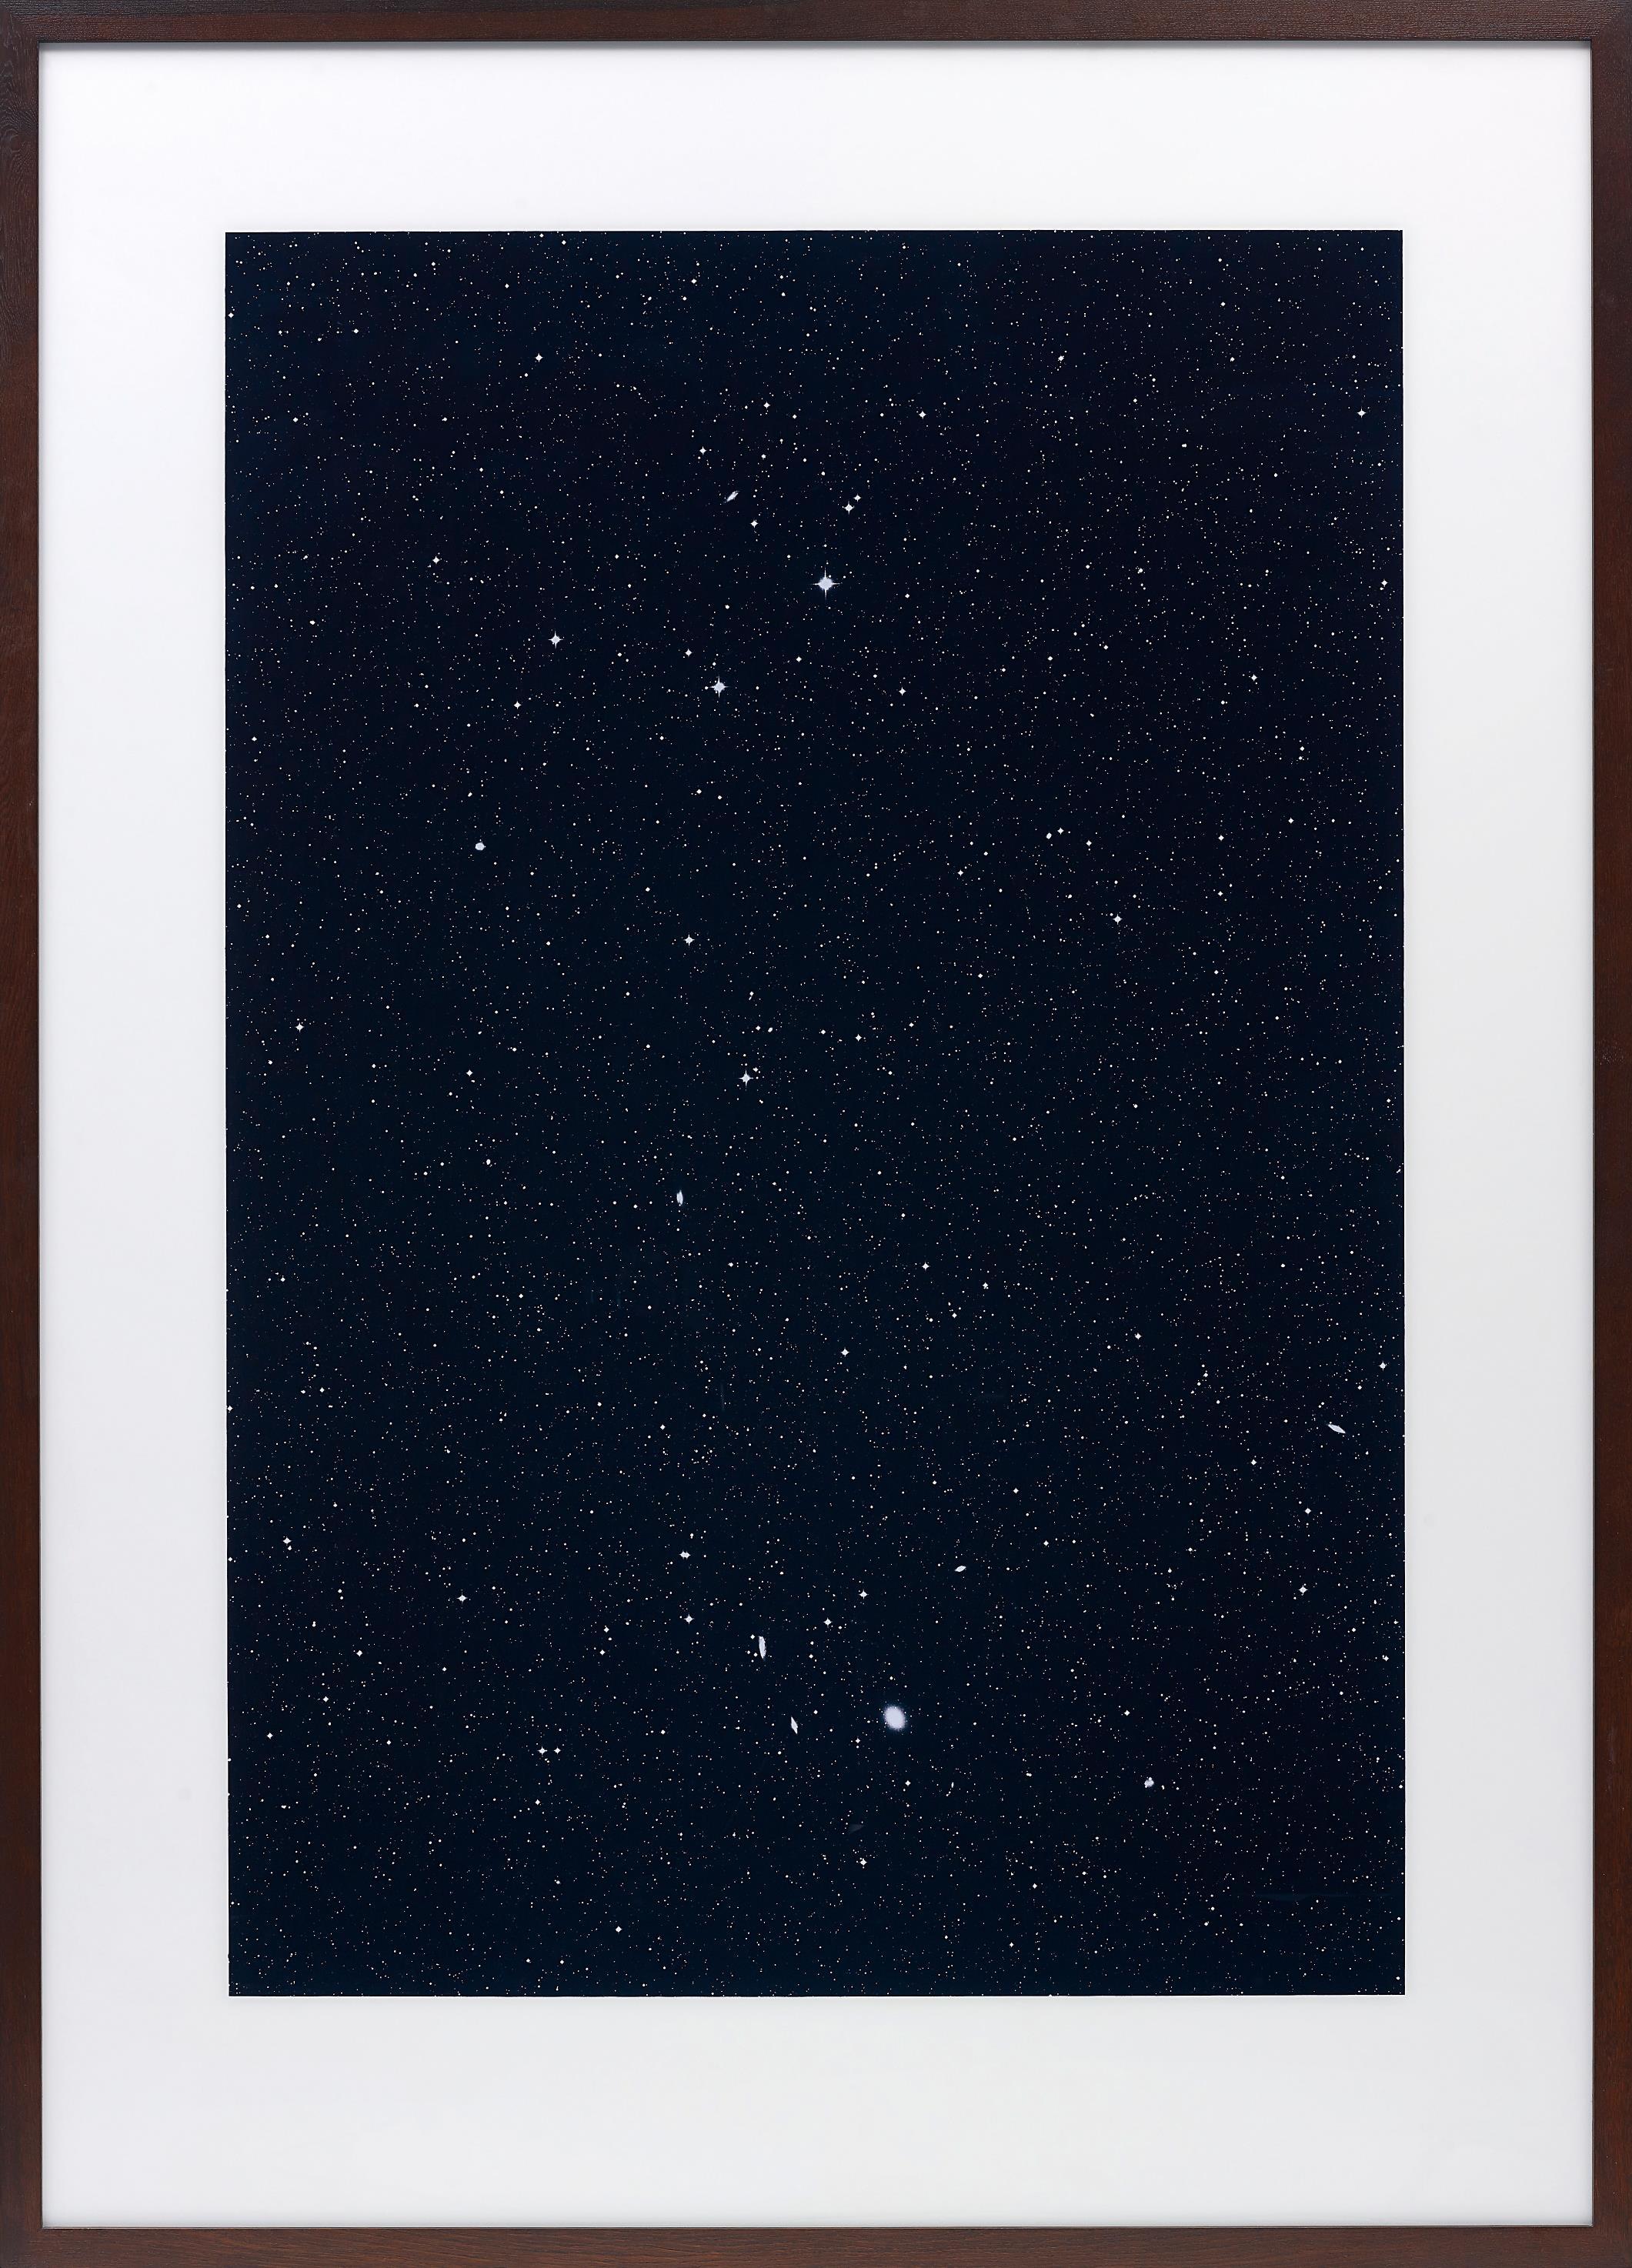 Sterne 11H 12M/-35°-1989